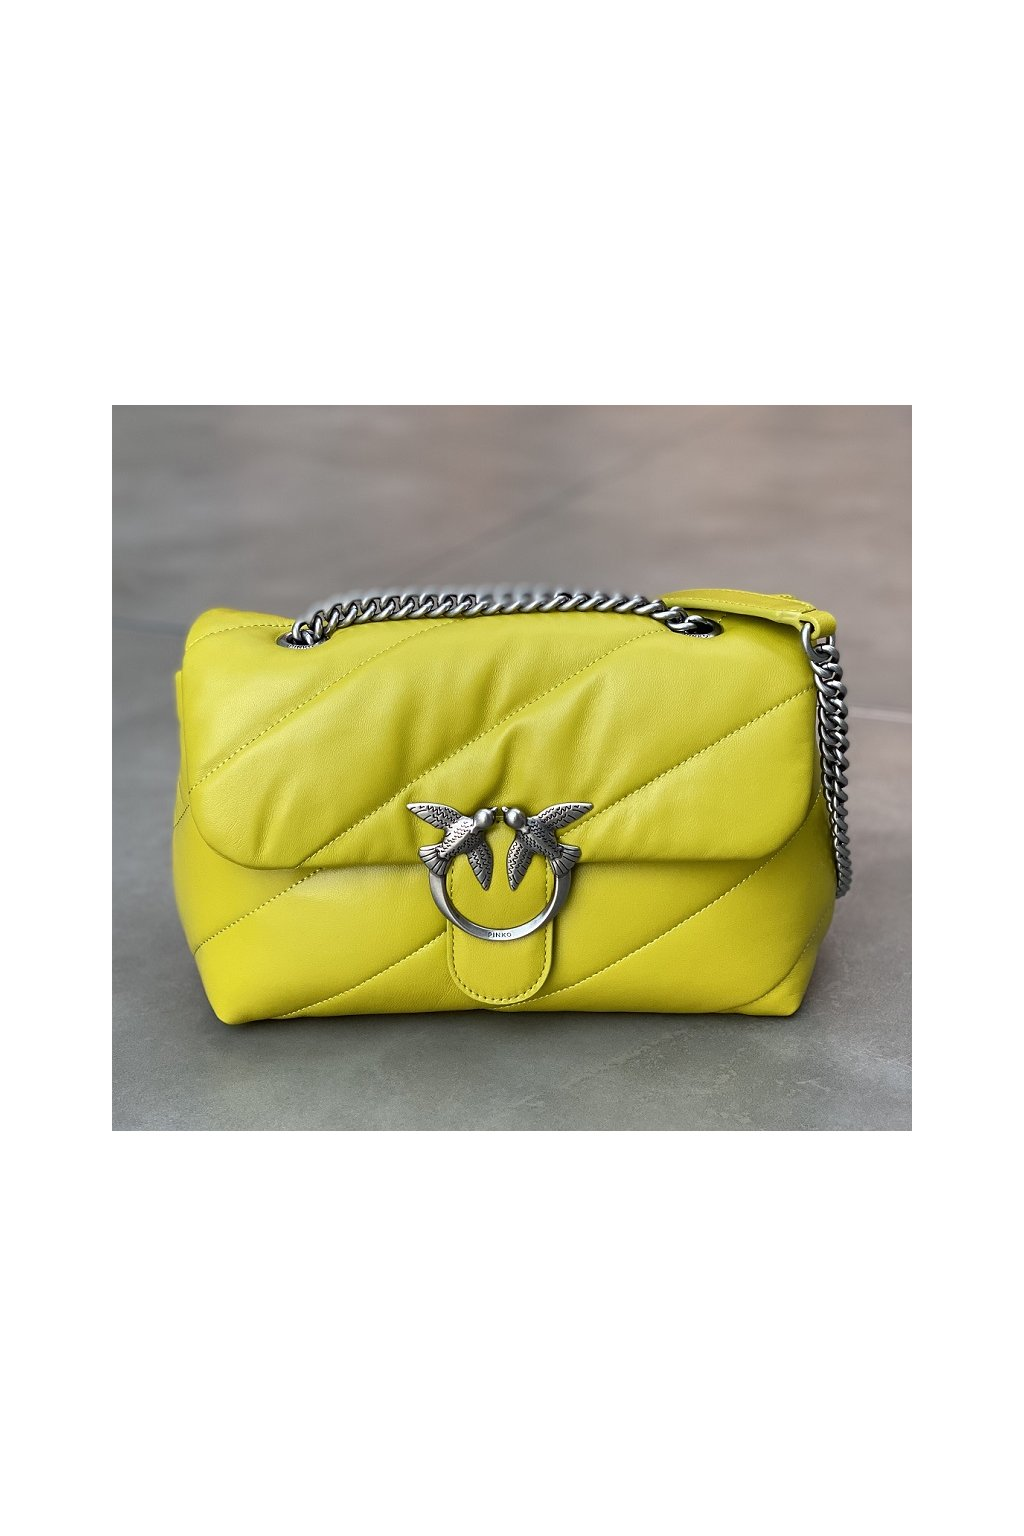 1P222W Y6Y4 T56 Dámská kabelka Pinko Love Classic Puff Maxi Quilt 2 Cl zelená